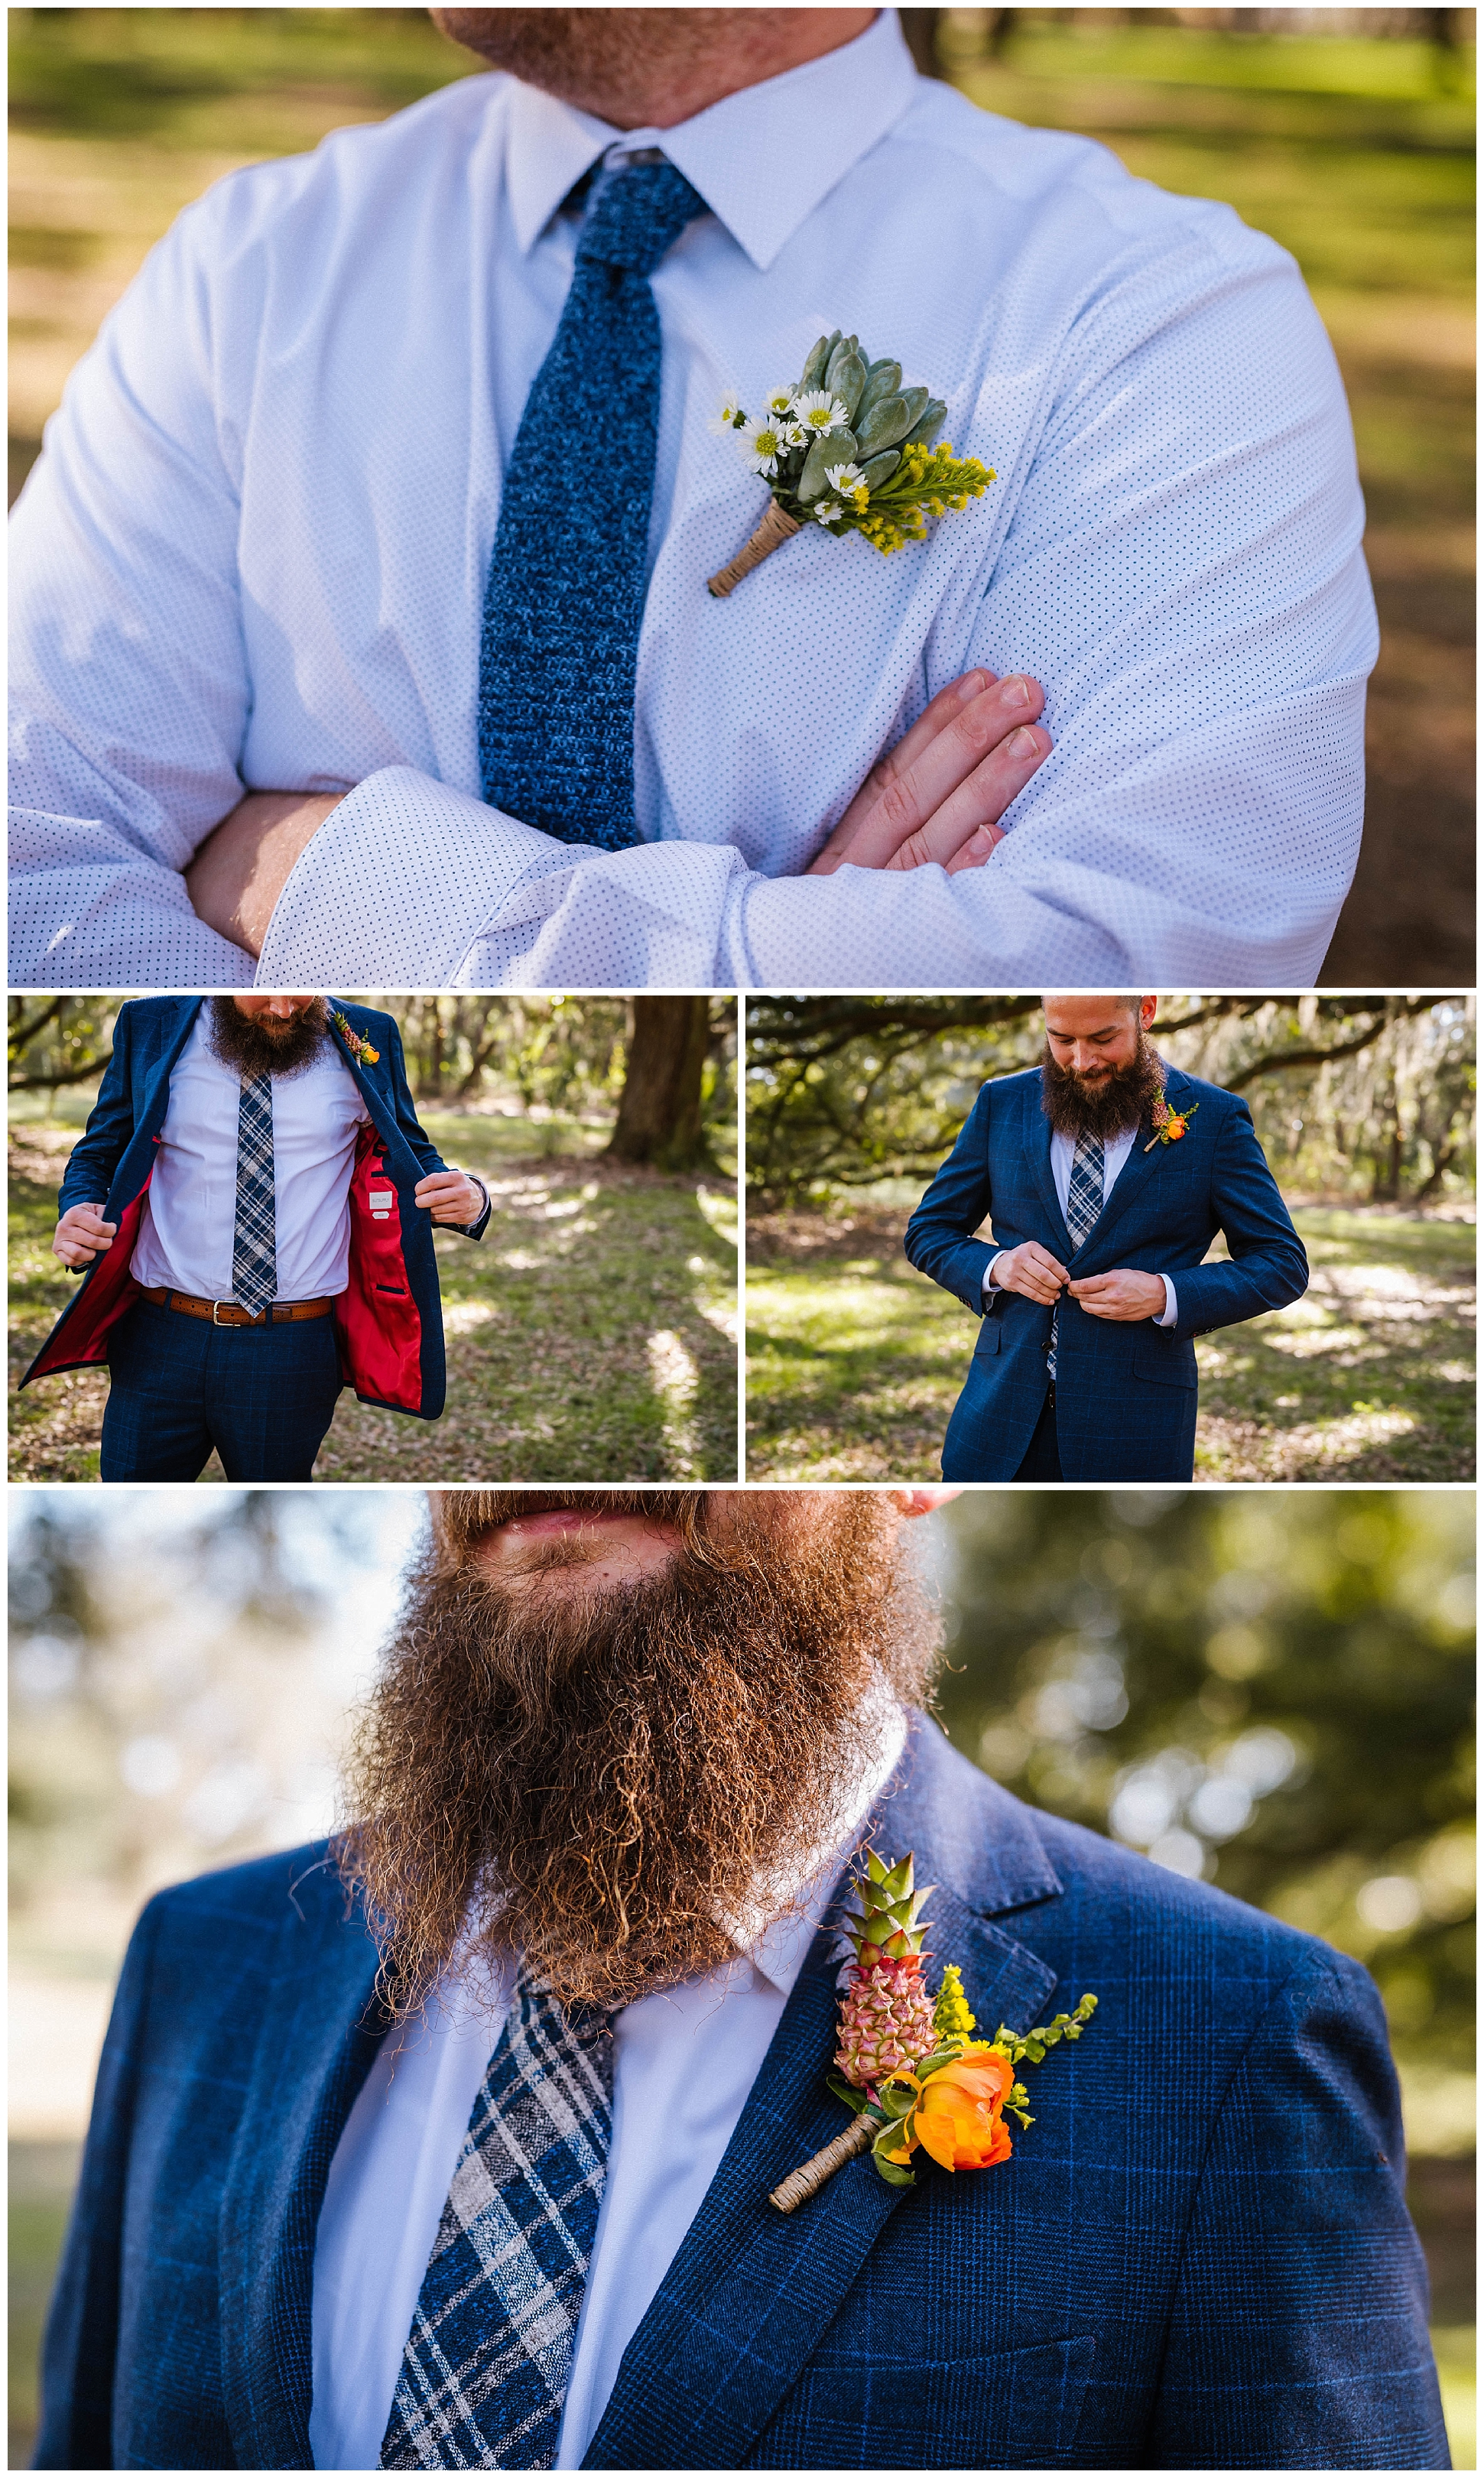 magical-outdoor-florida-wedding-smoke-bombs-flowers-crown-beard_0005.jpg